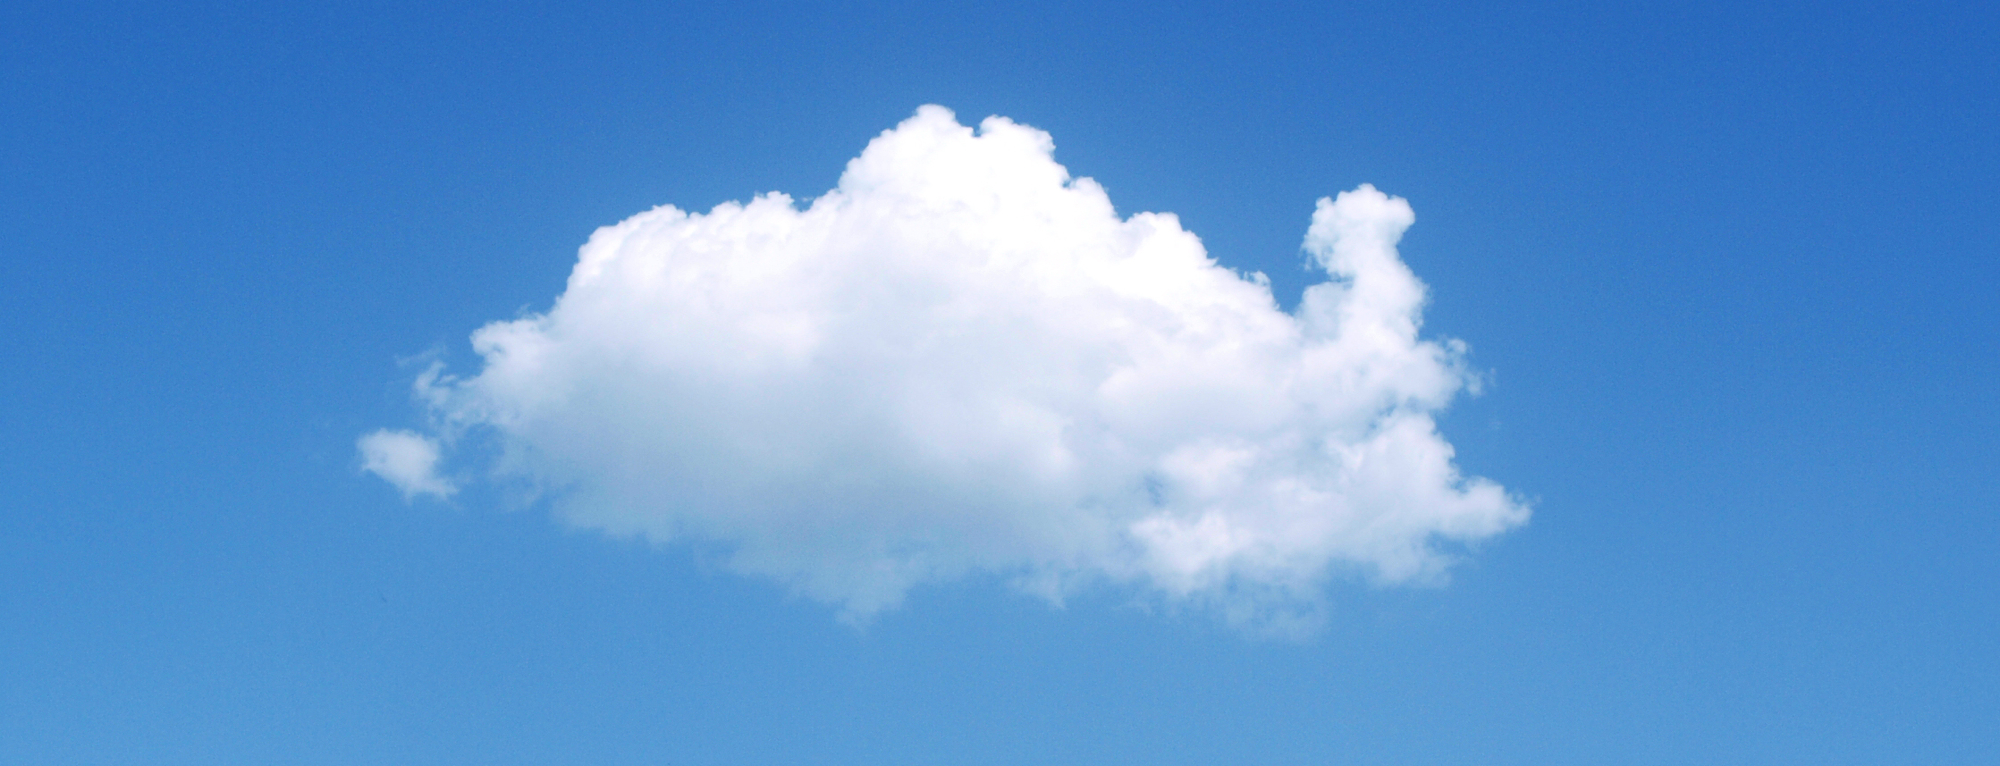 Enterprise Cloud: No silver linings here